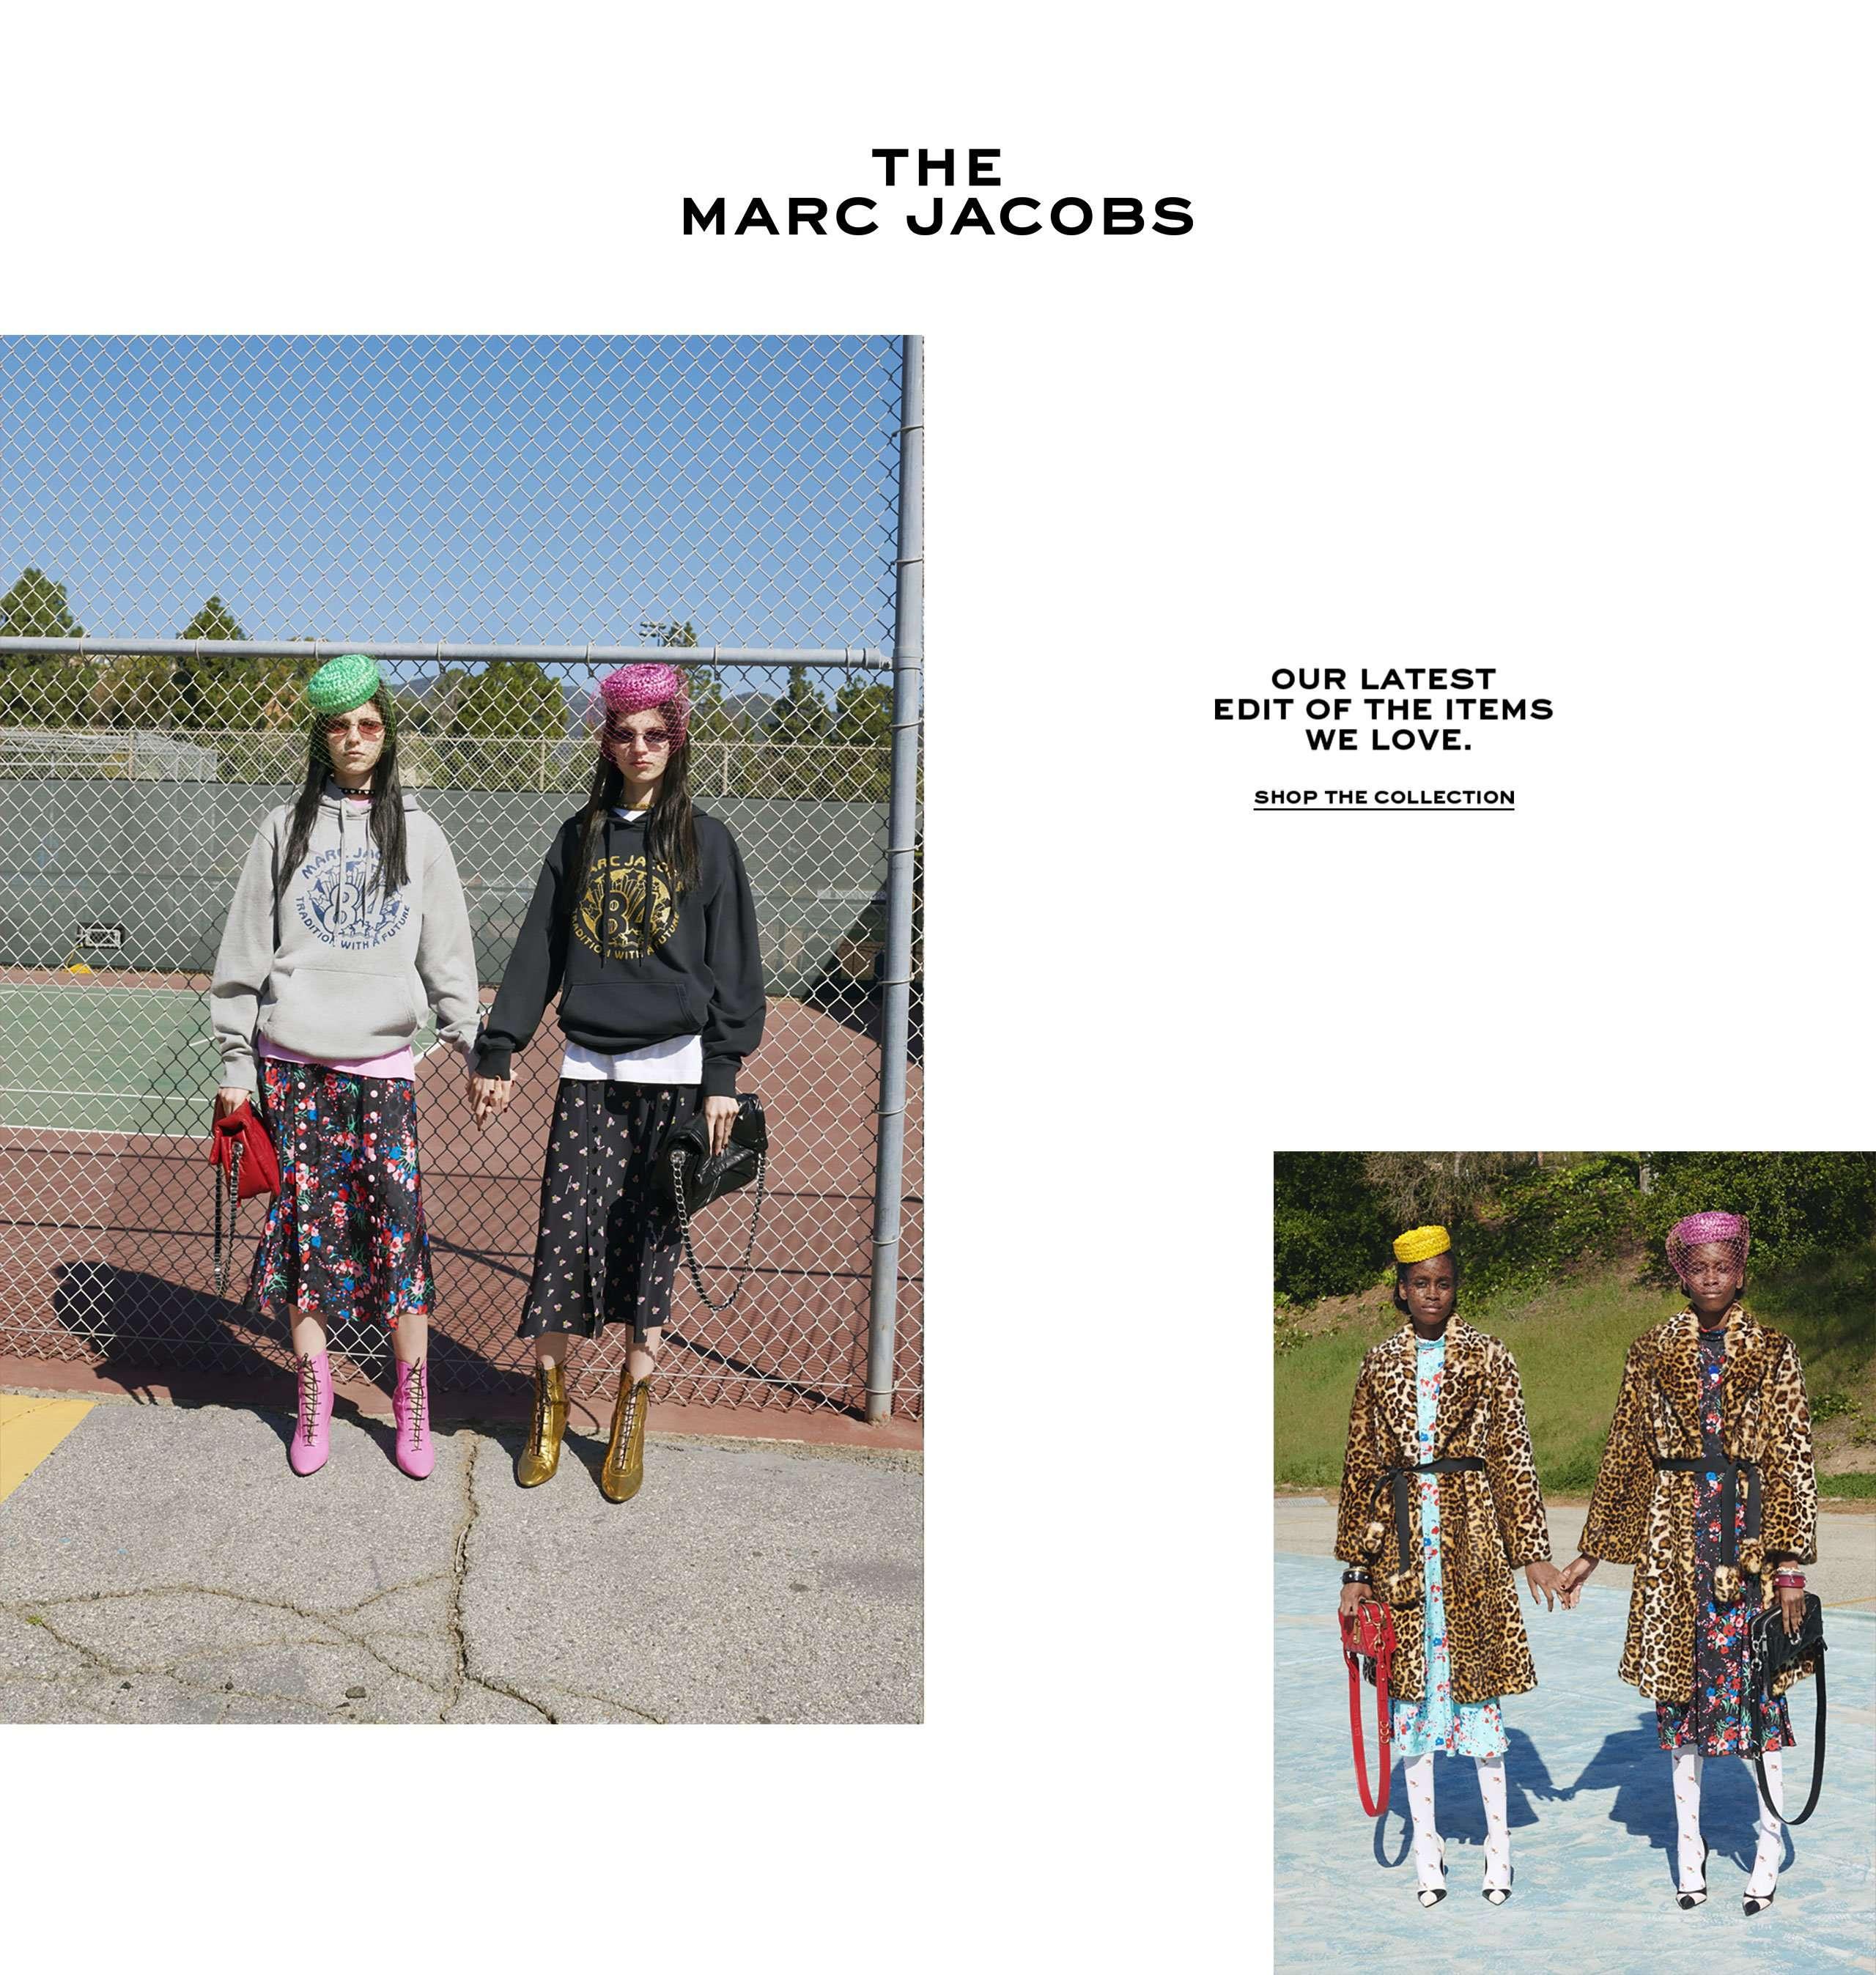 huge discount 5c1db 72968 Marc Jacobs | Official Site